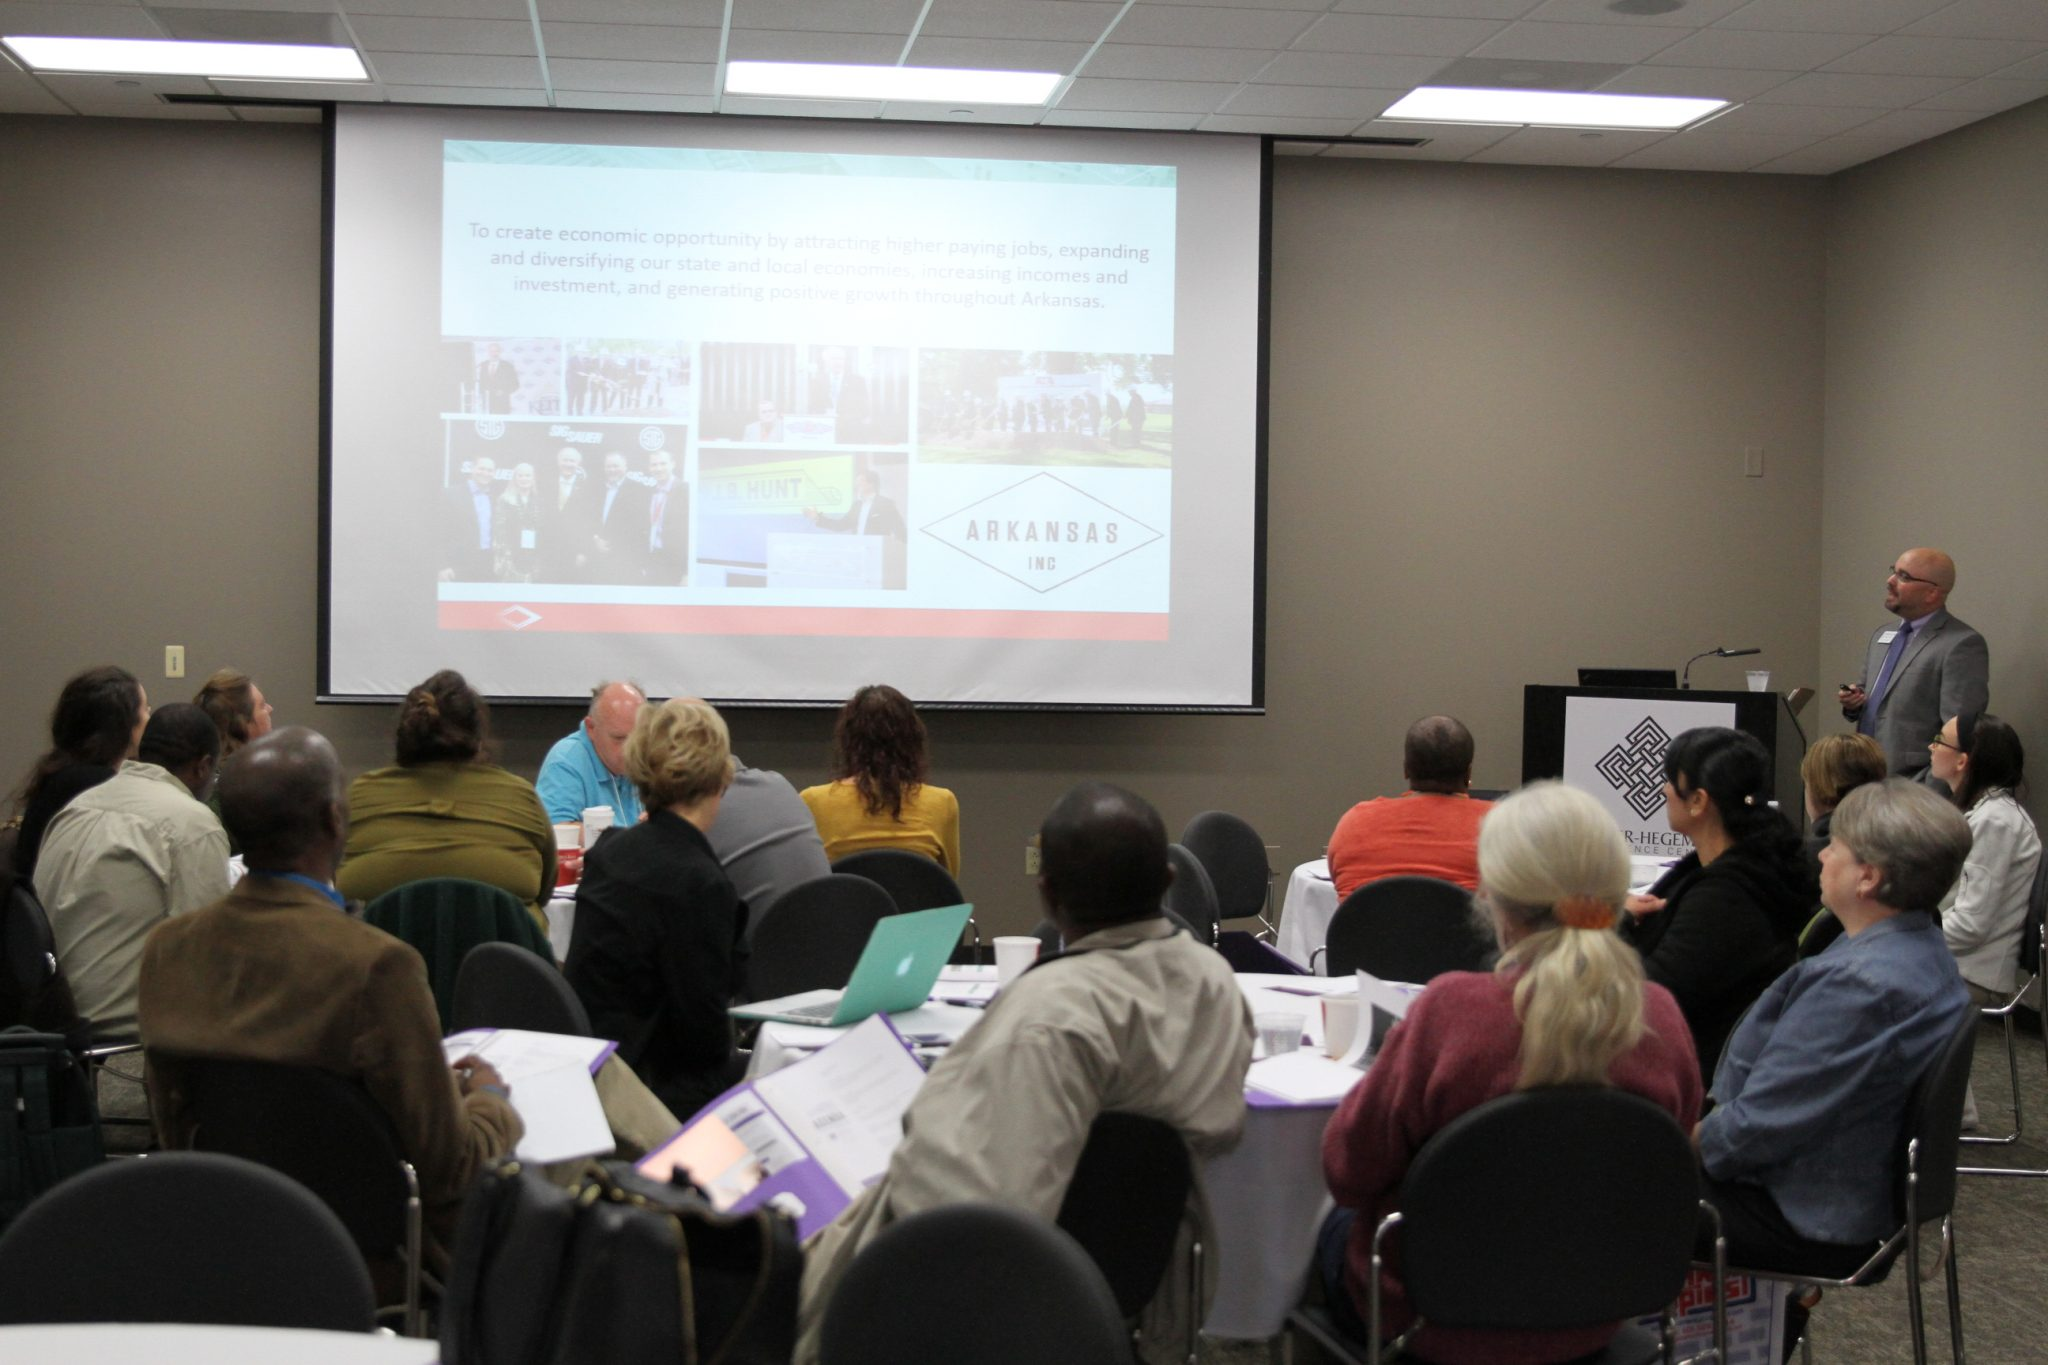 CDI participants listen to a presentation given by Matt Twyford of the Arkansas Economic Development Commission (AEDC).